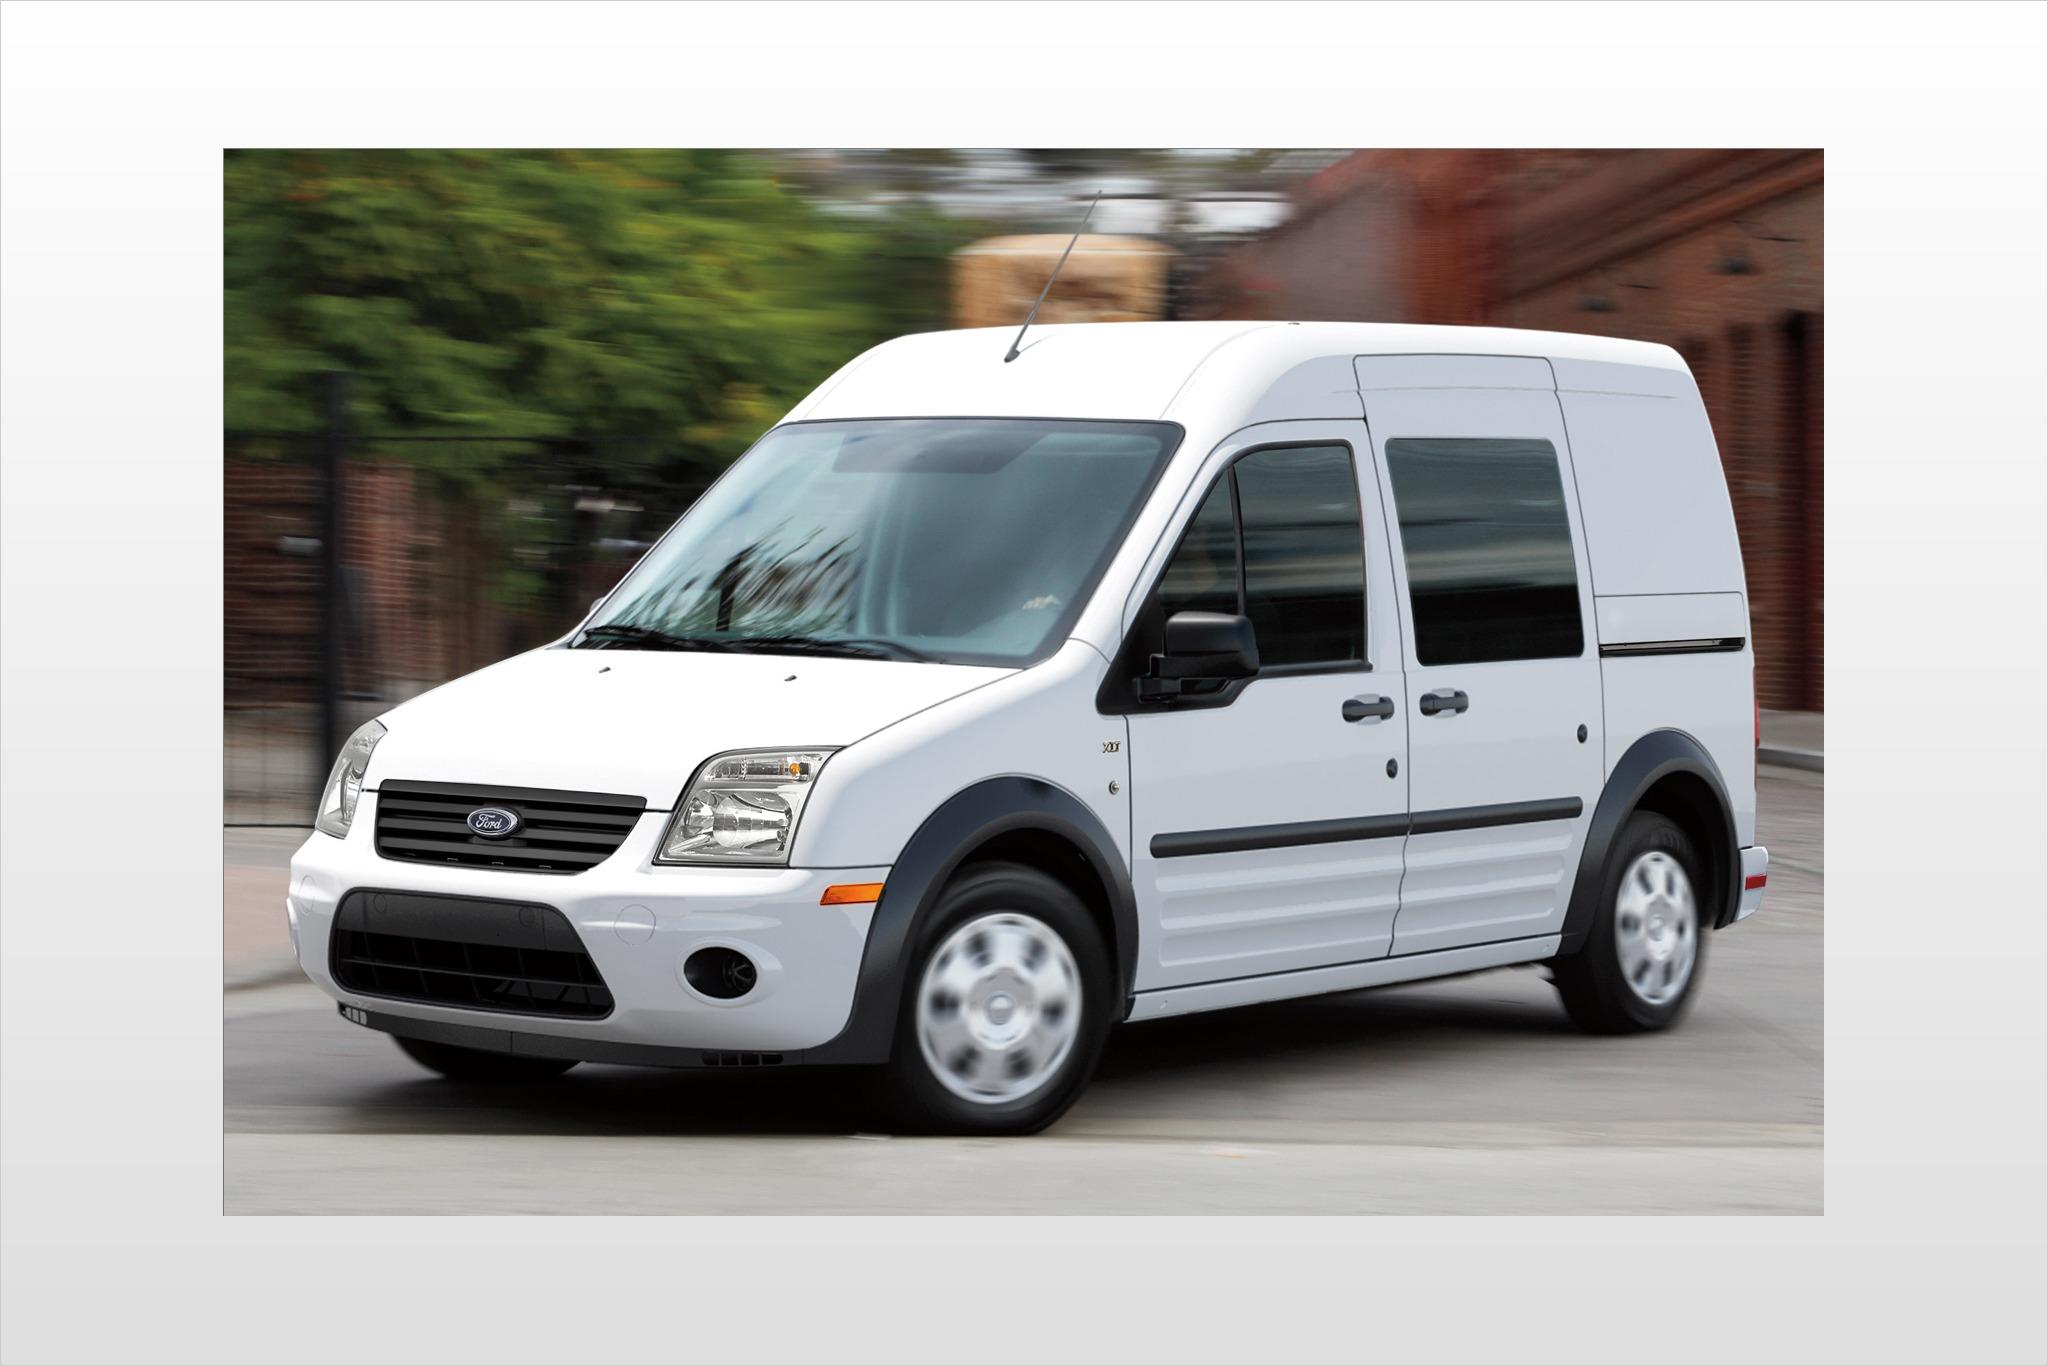 2010 ford transit connect cargo minivan cargo van xlt fq oem 3 2048